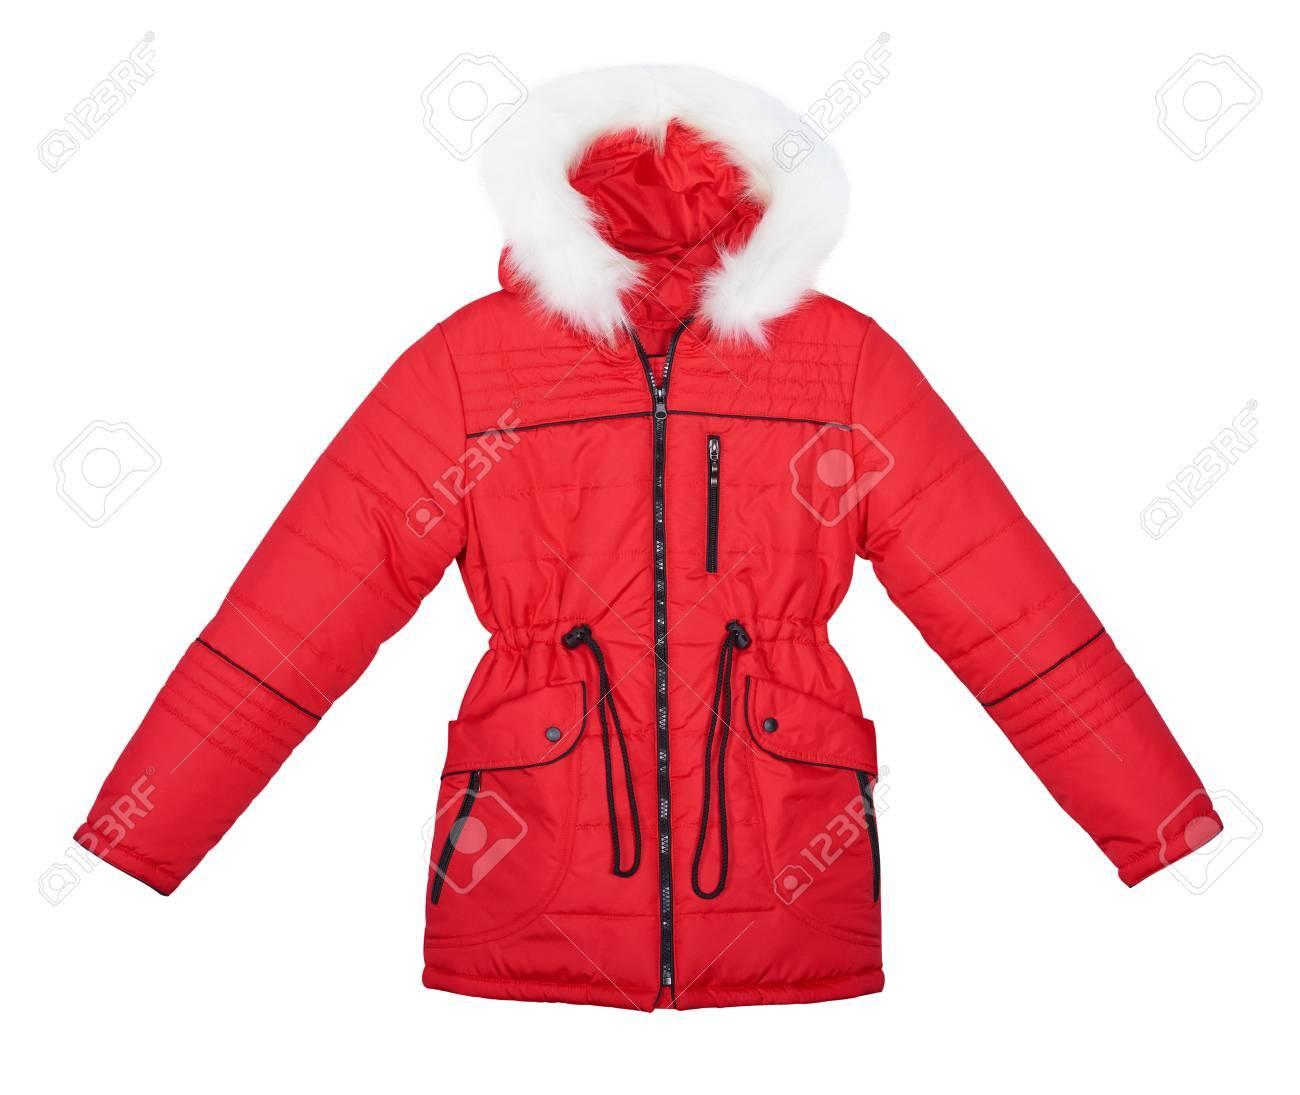 rote jacke mit weißem fell